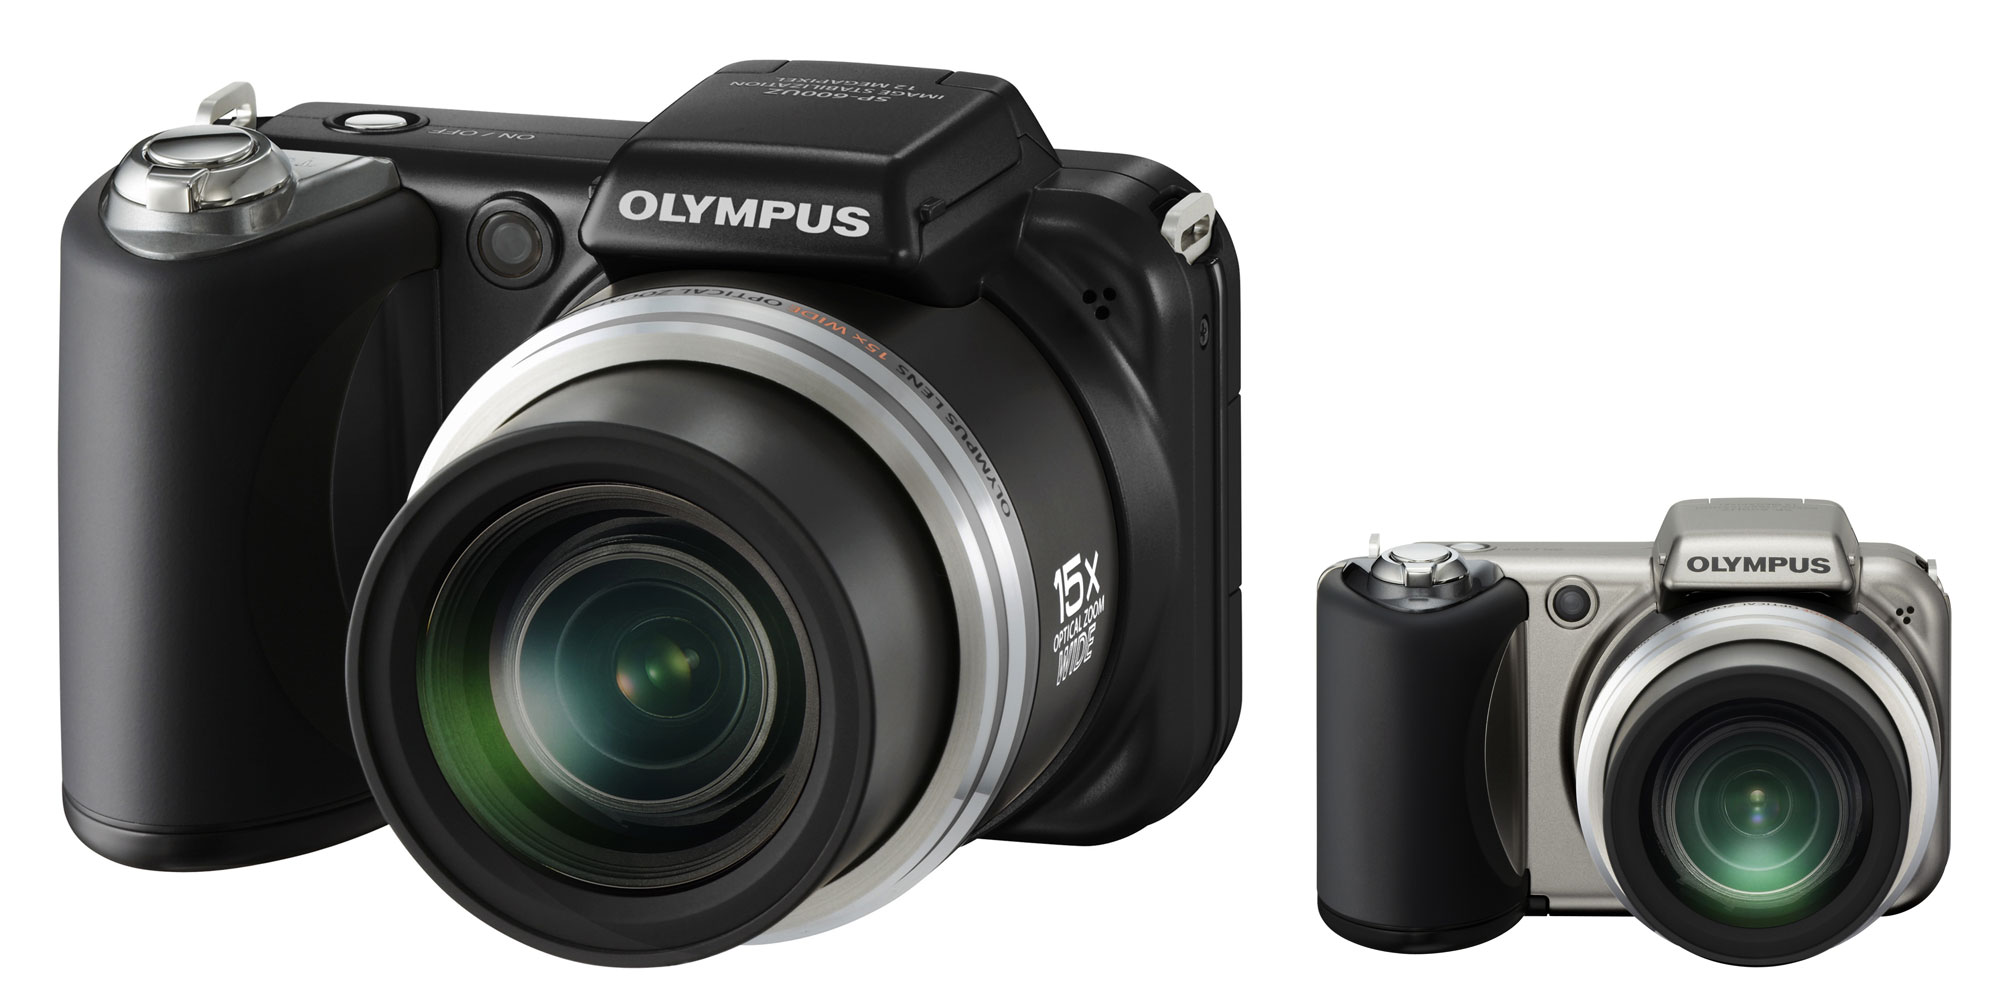 Digital olympus sp 600 uz classic black никон ремонт по гарантии краснодар